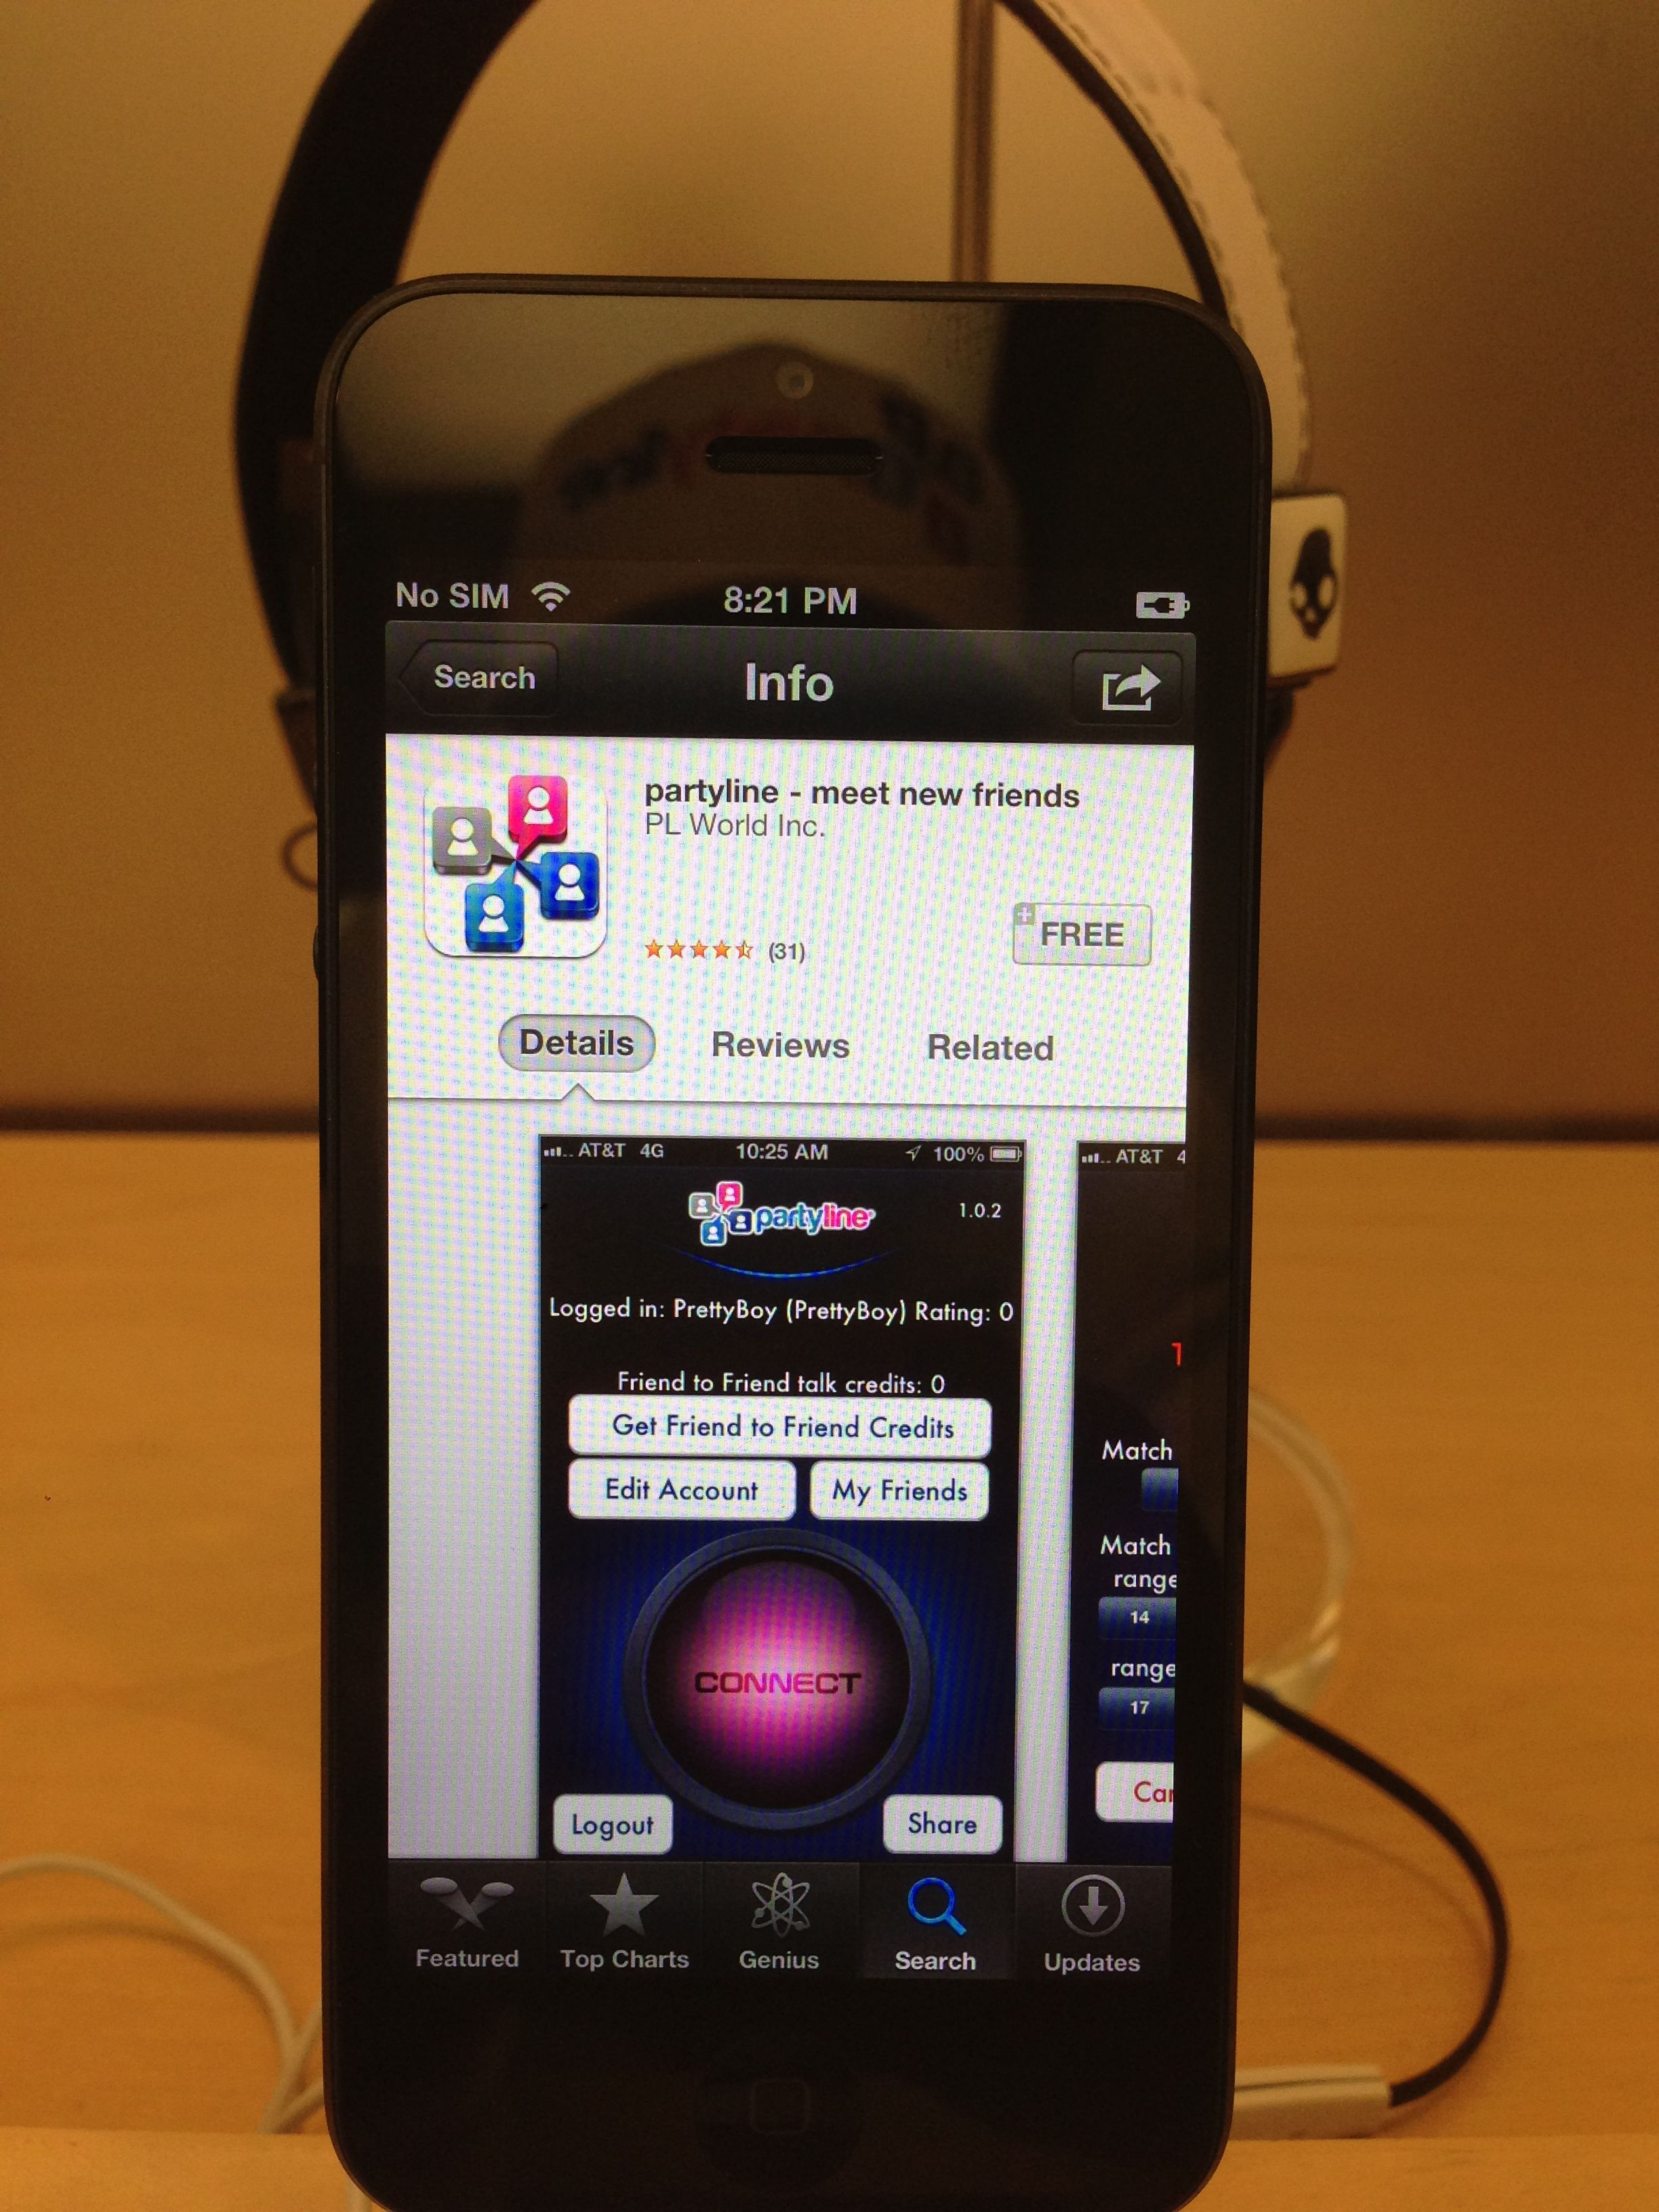 Download on your iphoneipad meeting new friends meet